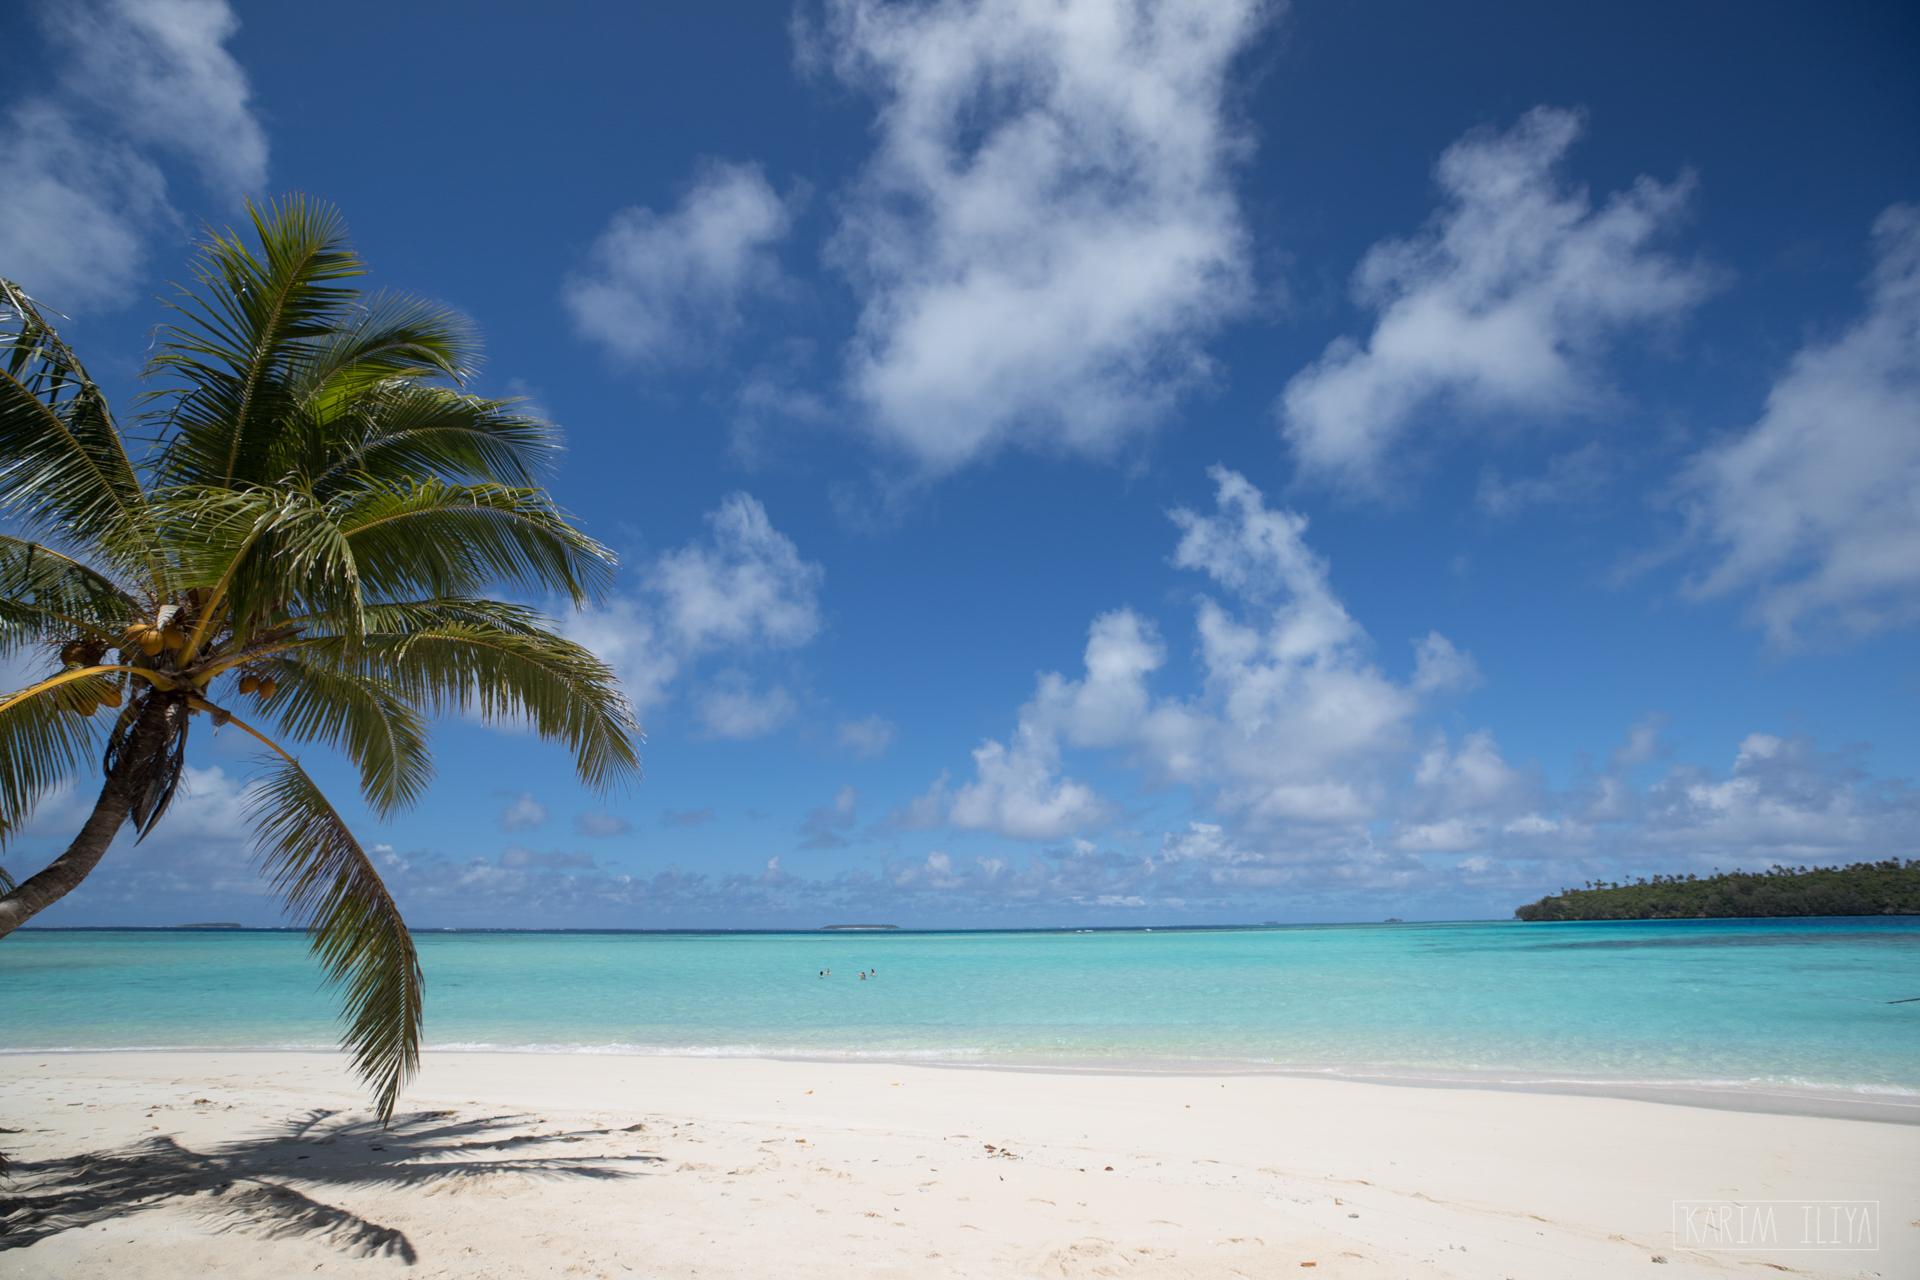 palm-tree-ocean-beach-sand.jpg